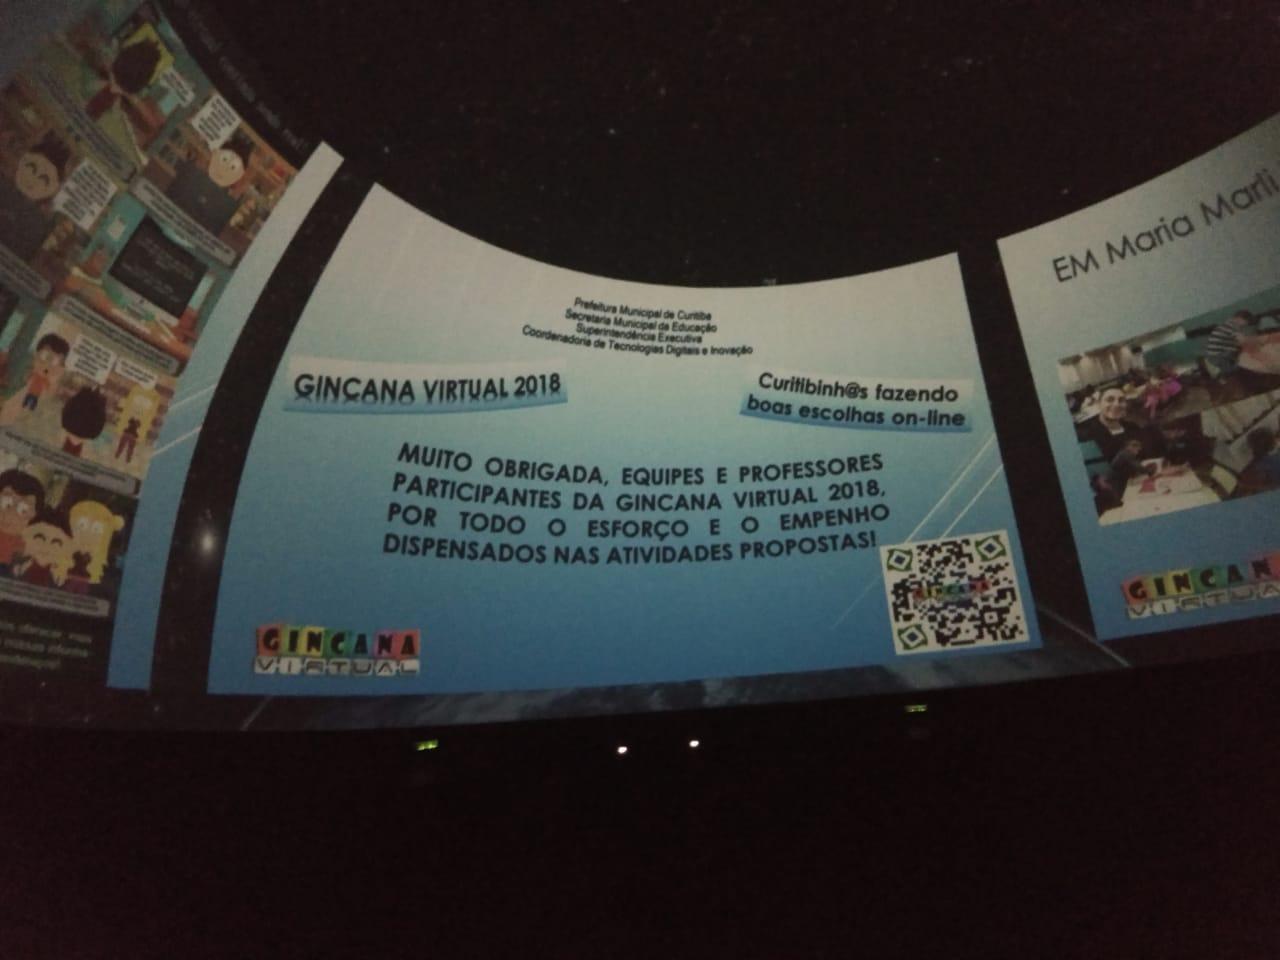 Fotos da Gincana Virtual 2018